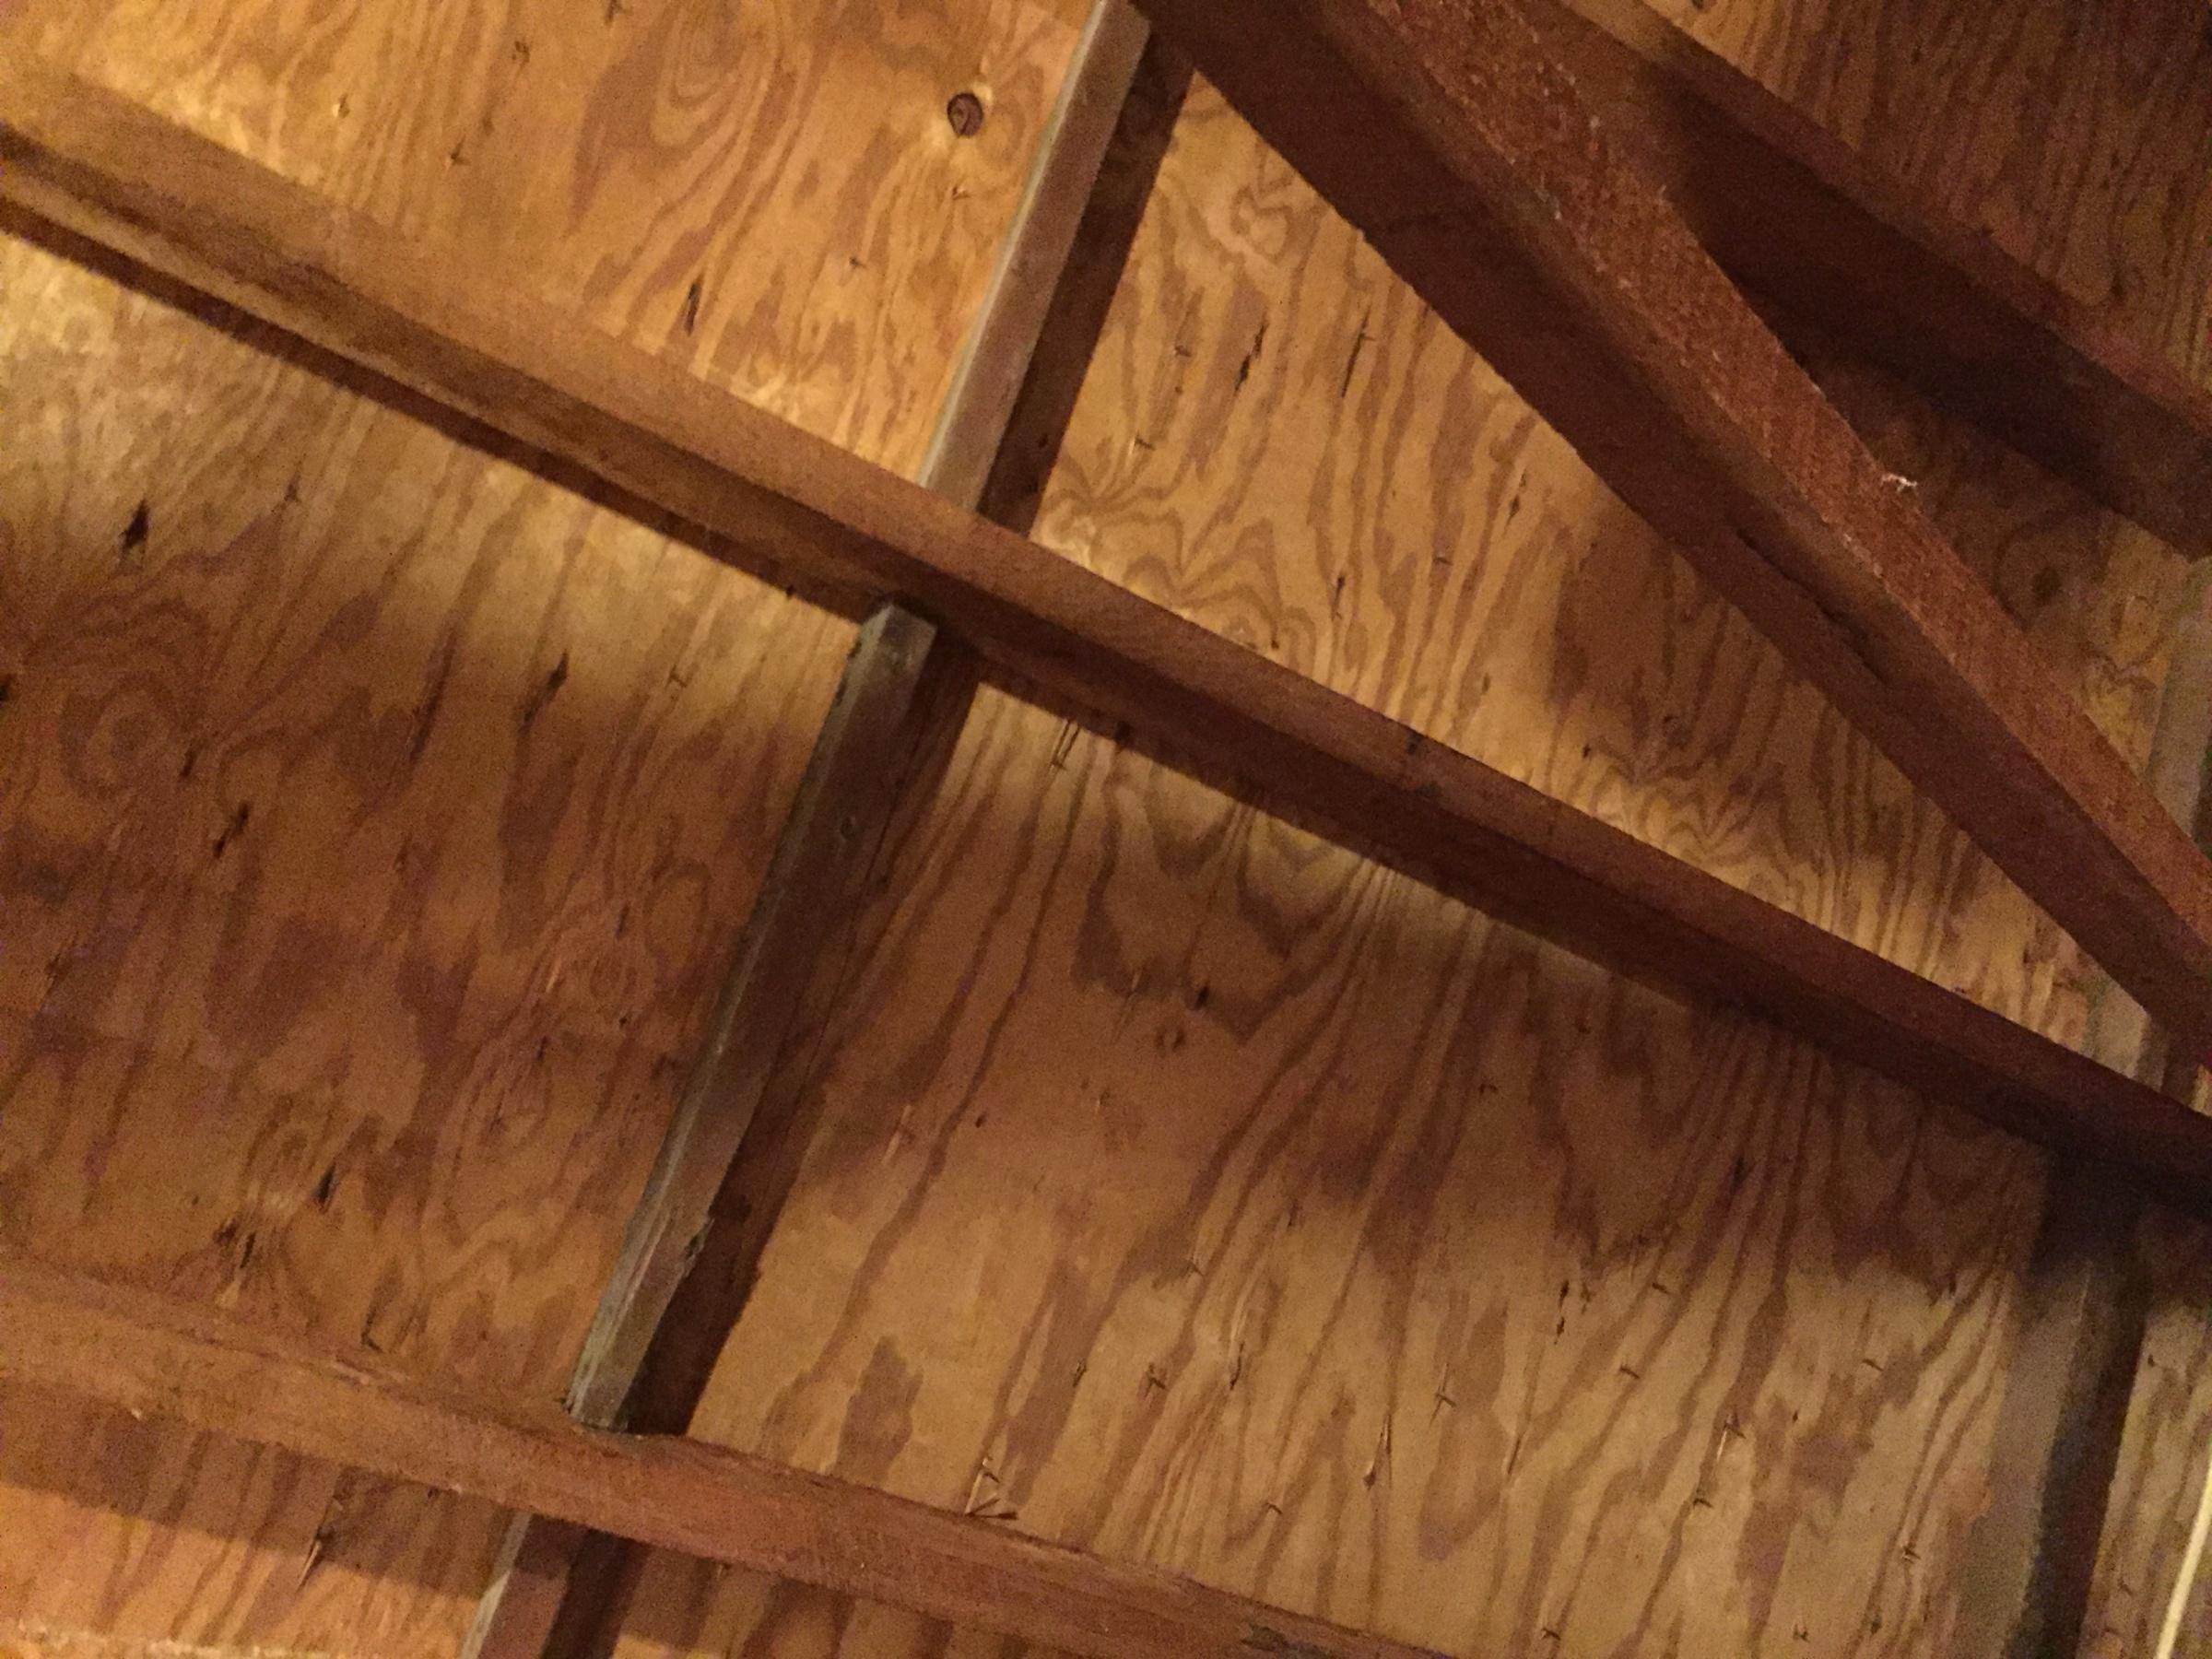 Insulating A Garage Insulation Diy Chatroom Home